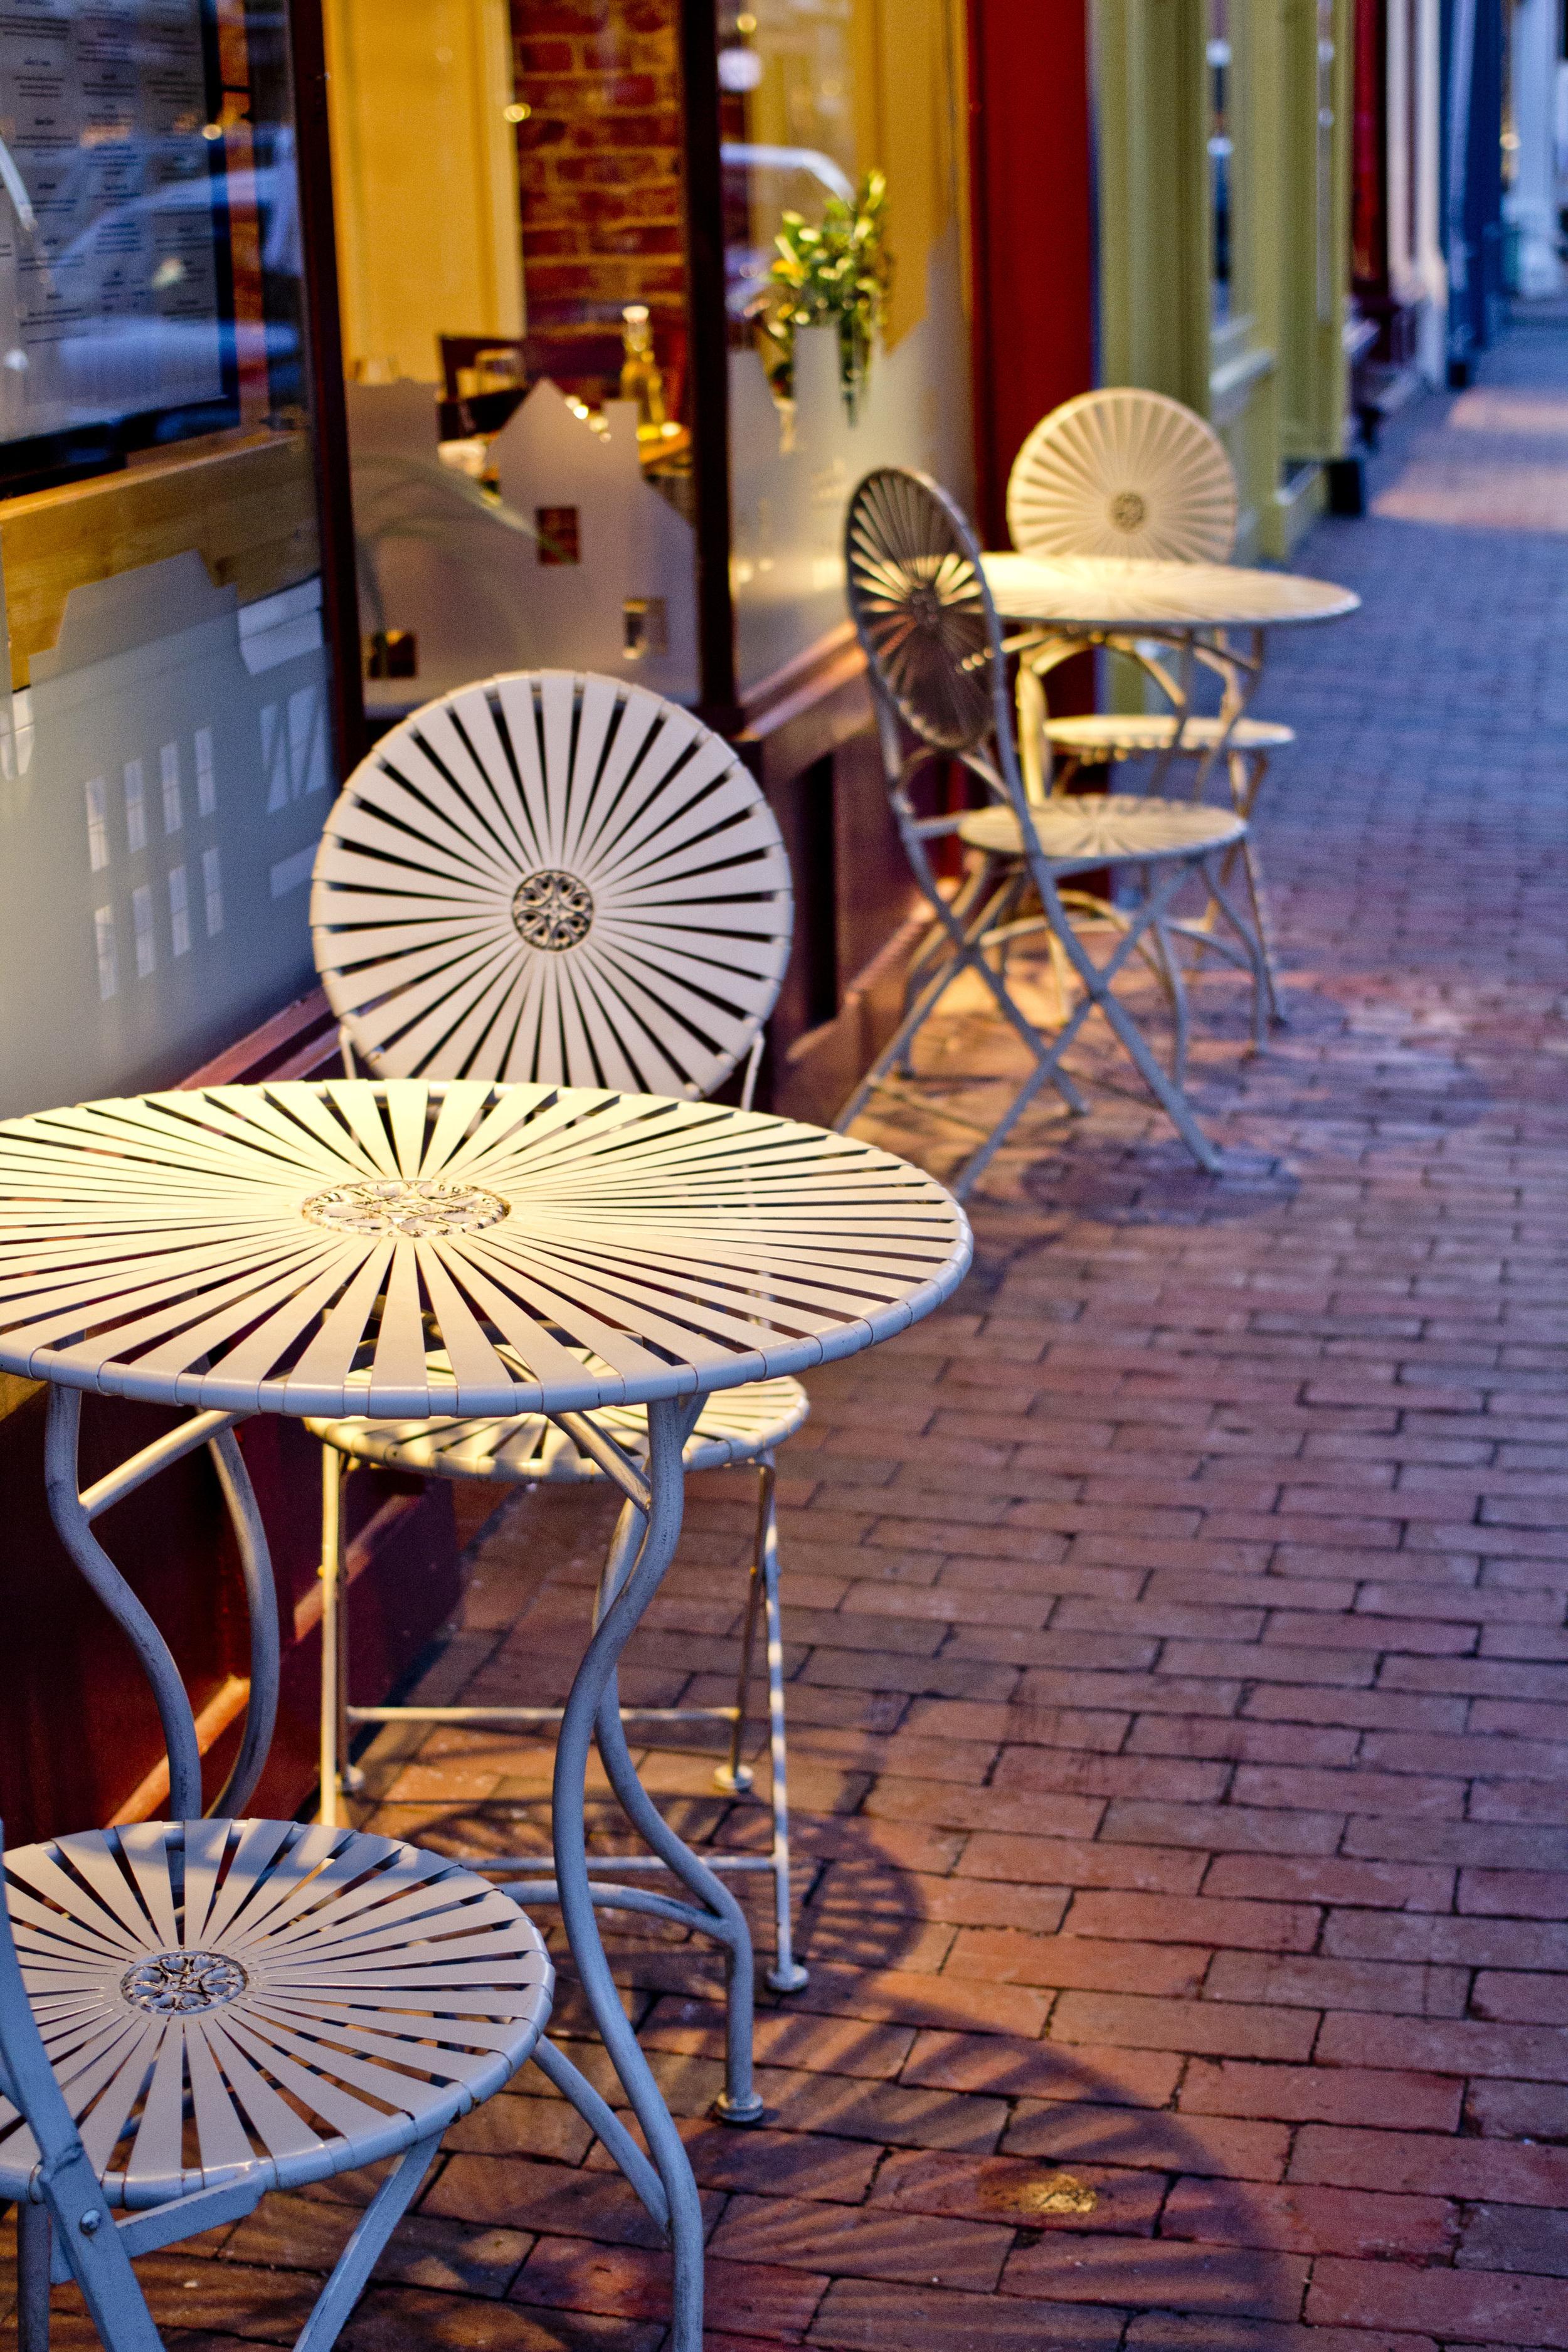 CafeIMG_2248.jpg